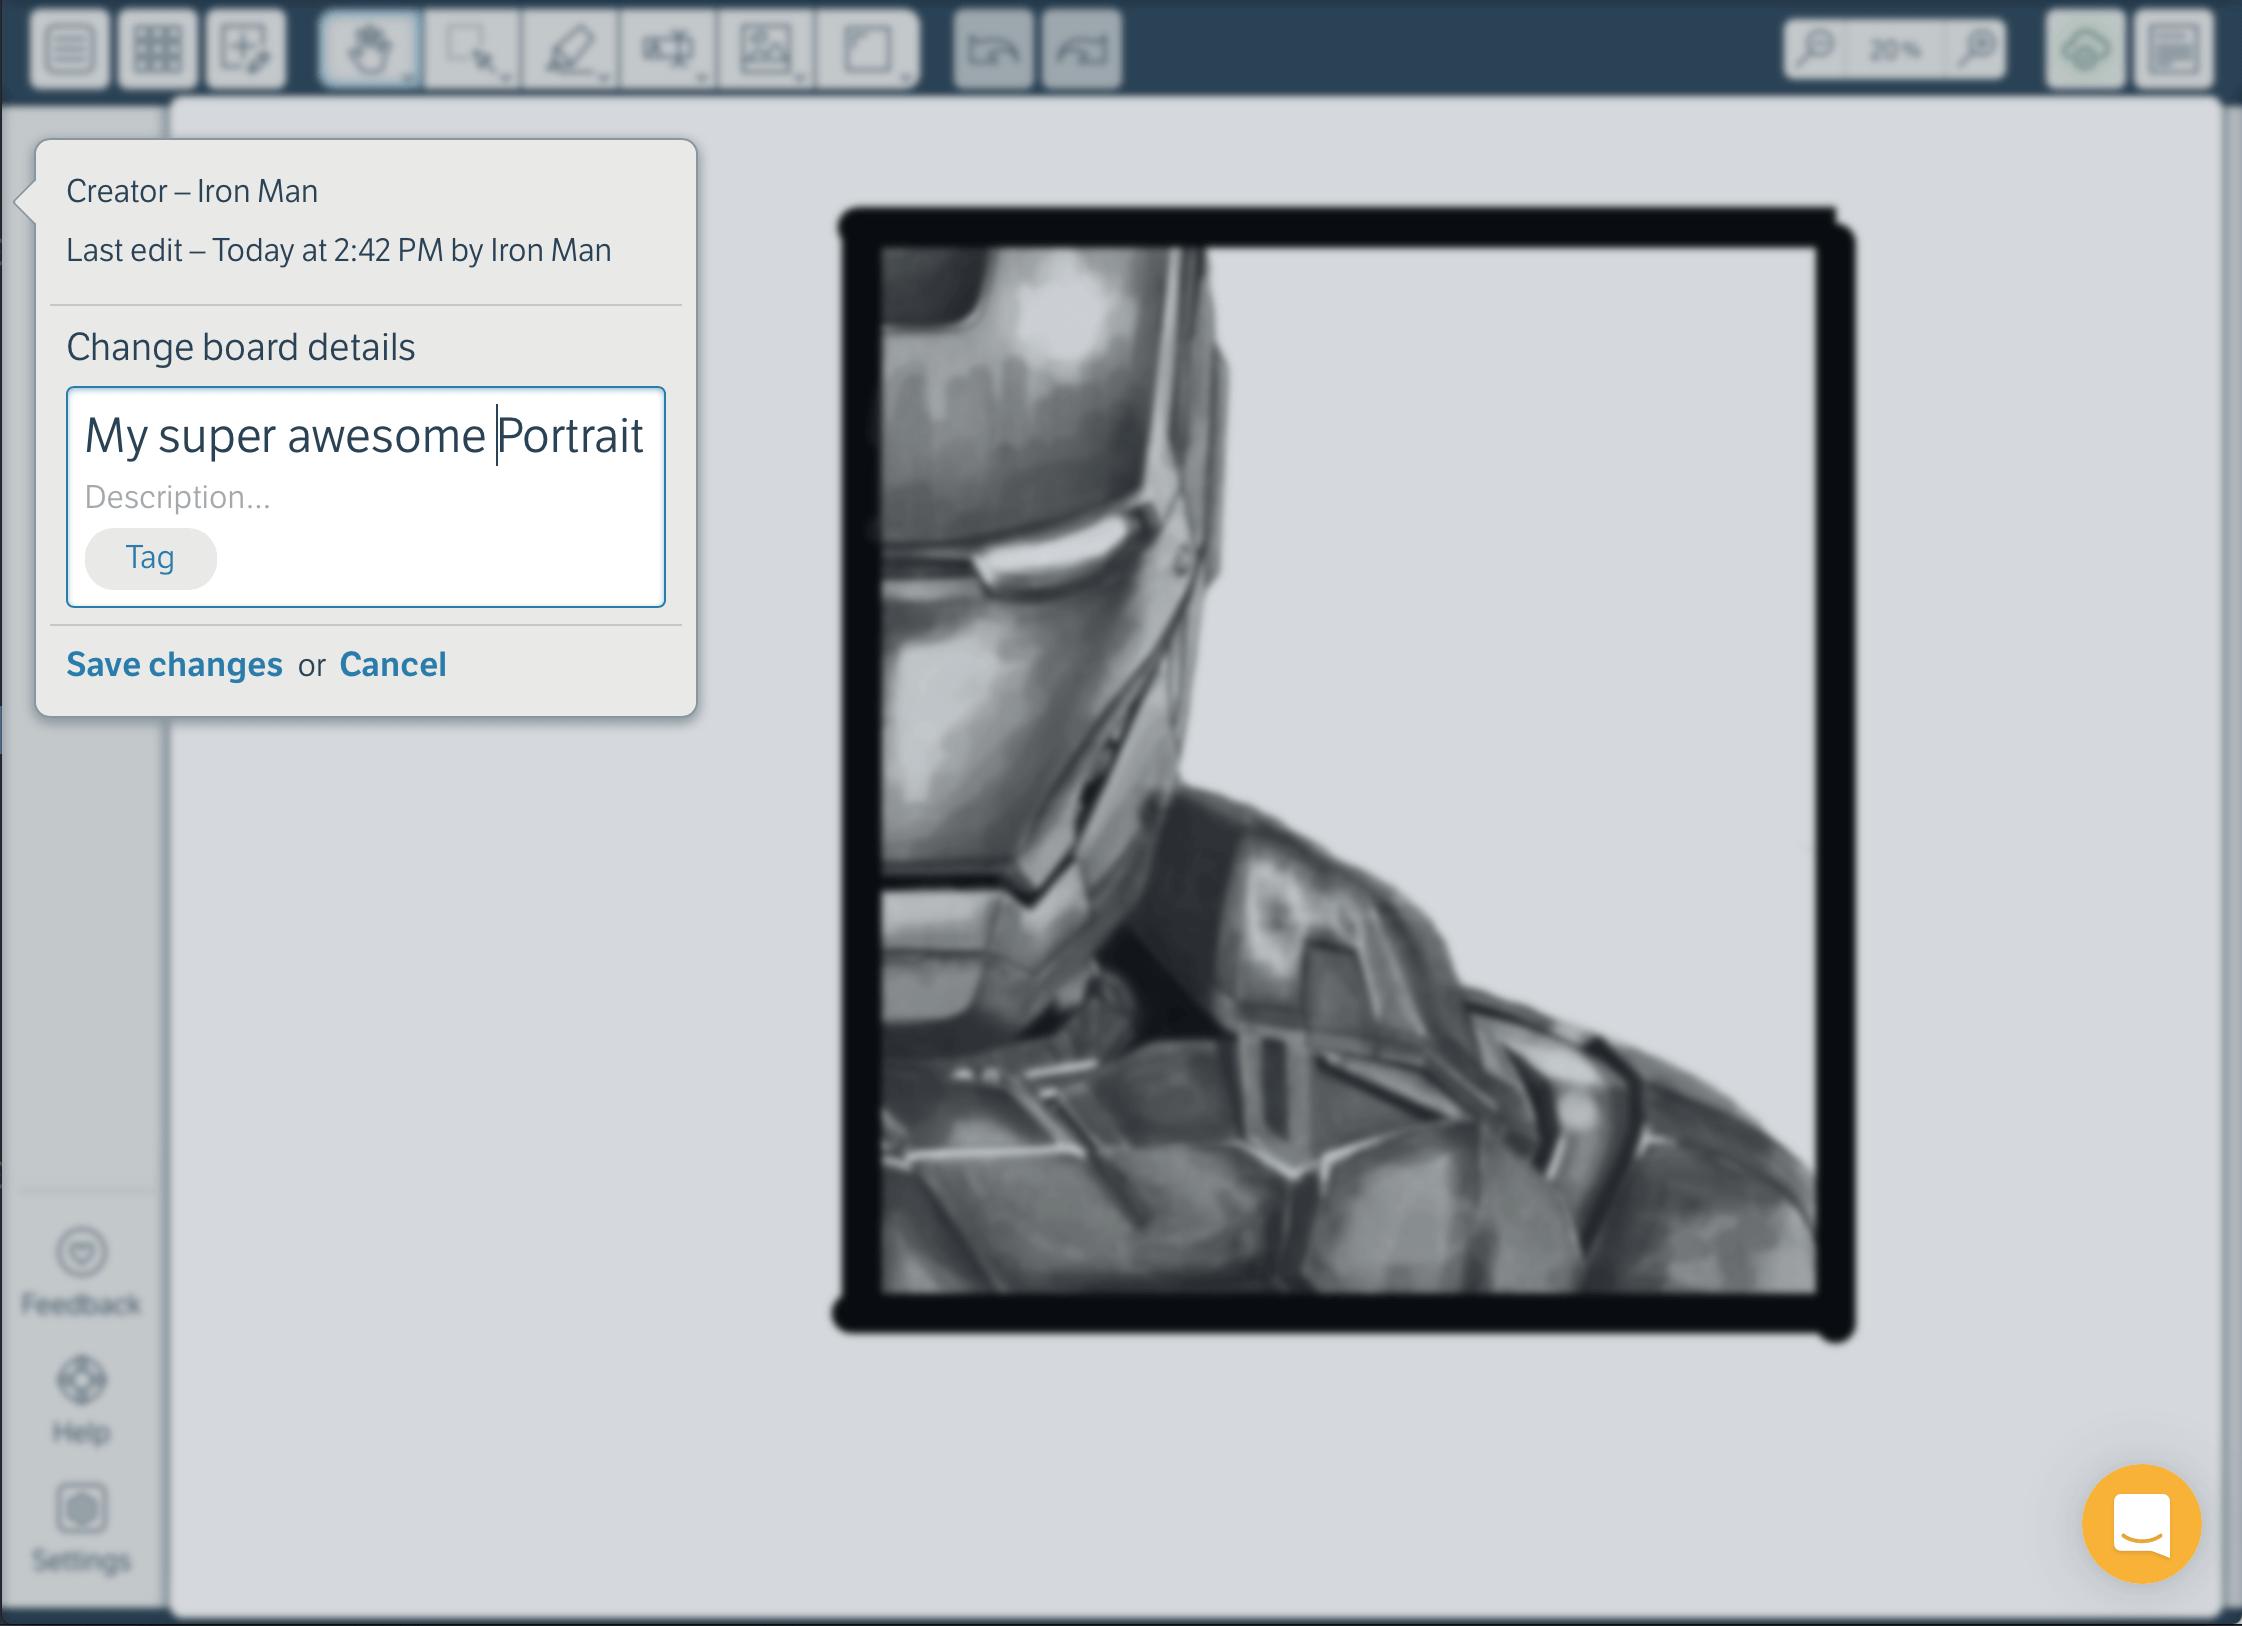 Edit board details